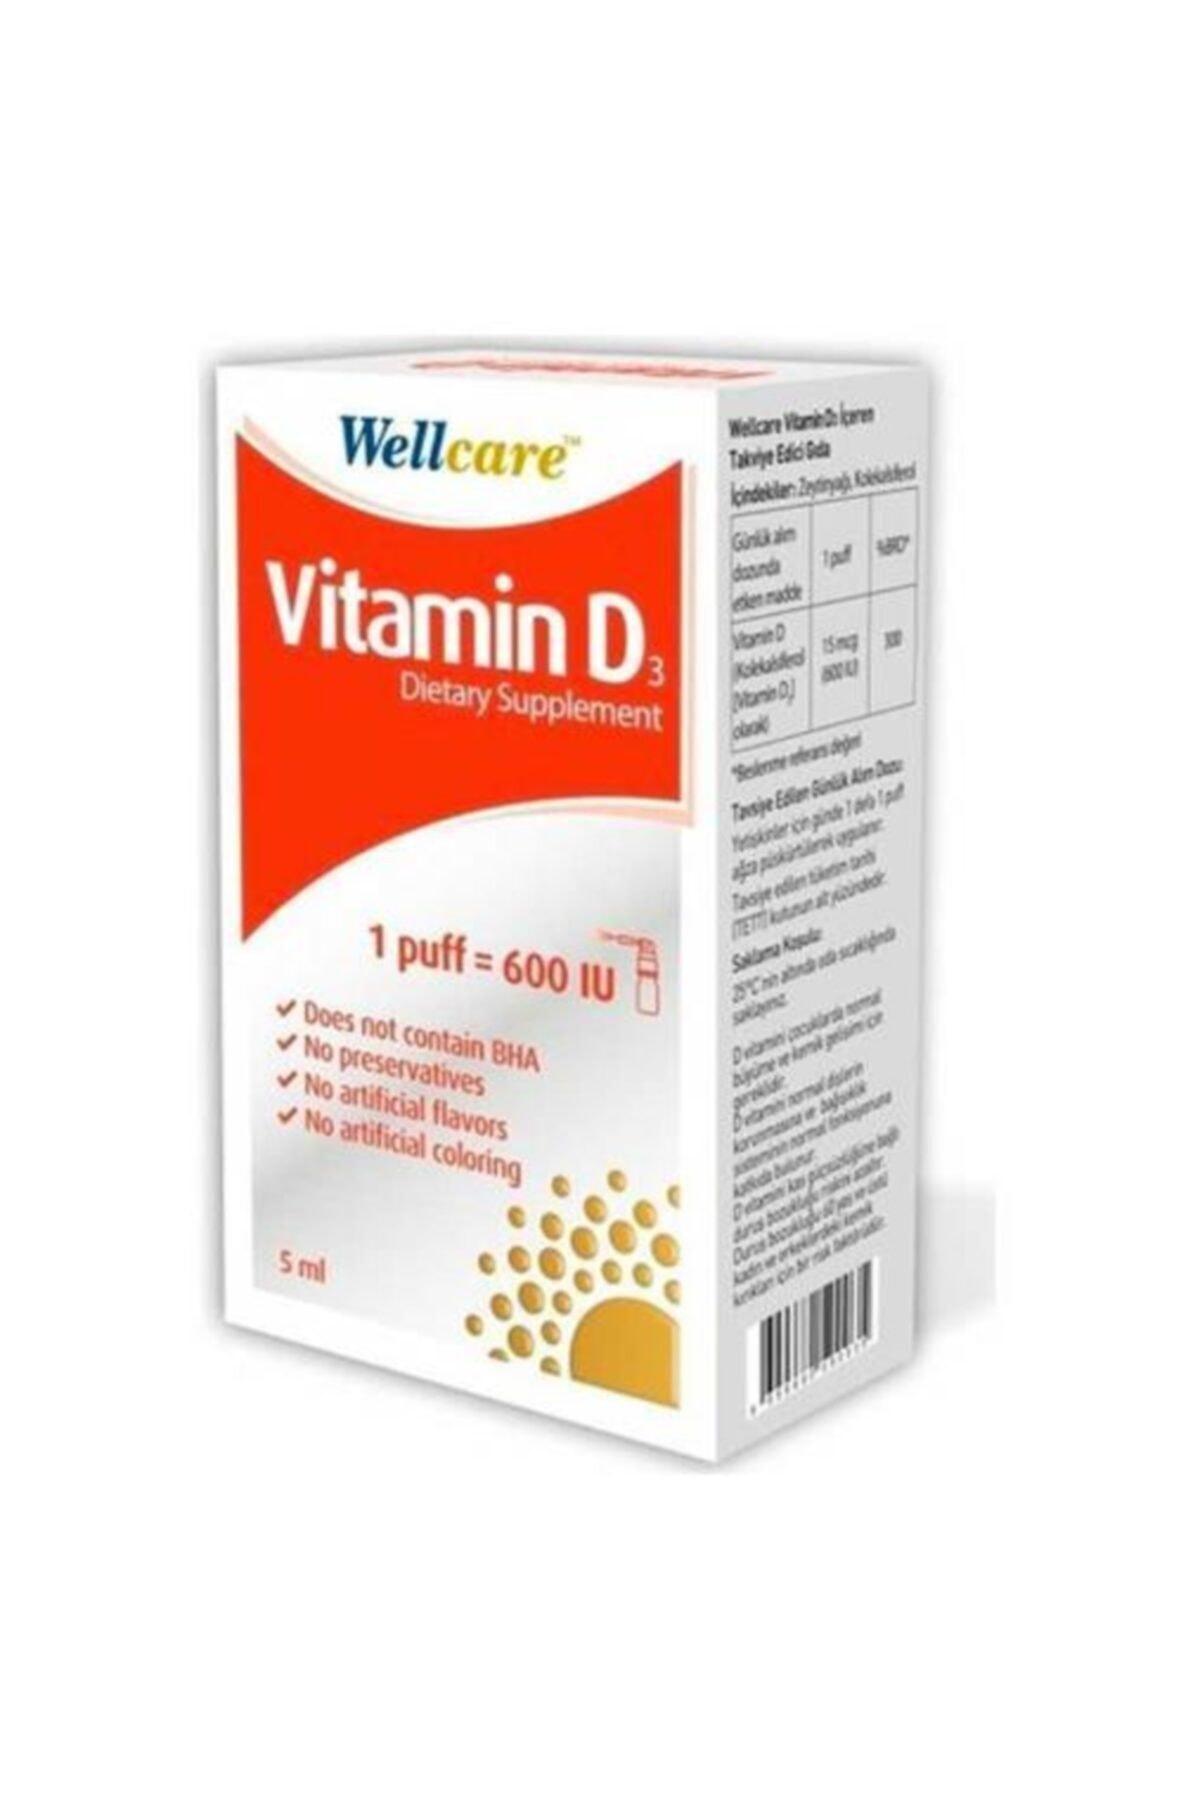 Wellcare Vitamin D3 600 Iu 5 ml 1